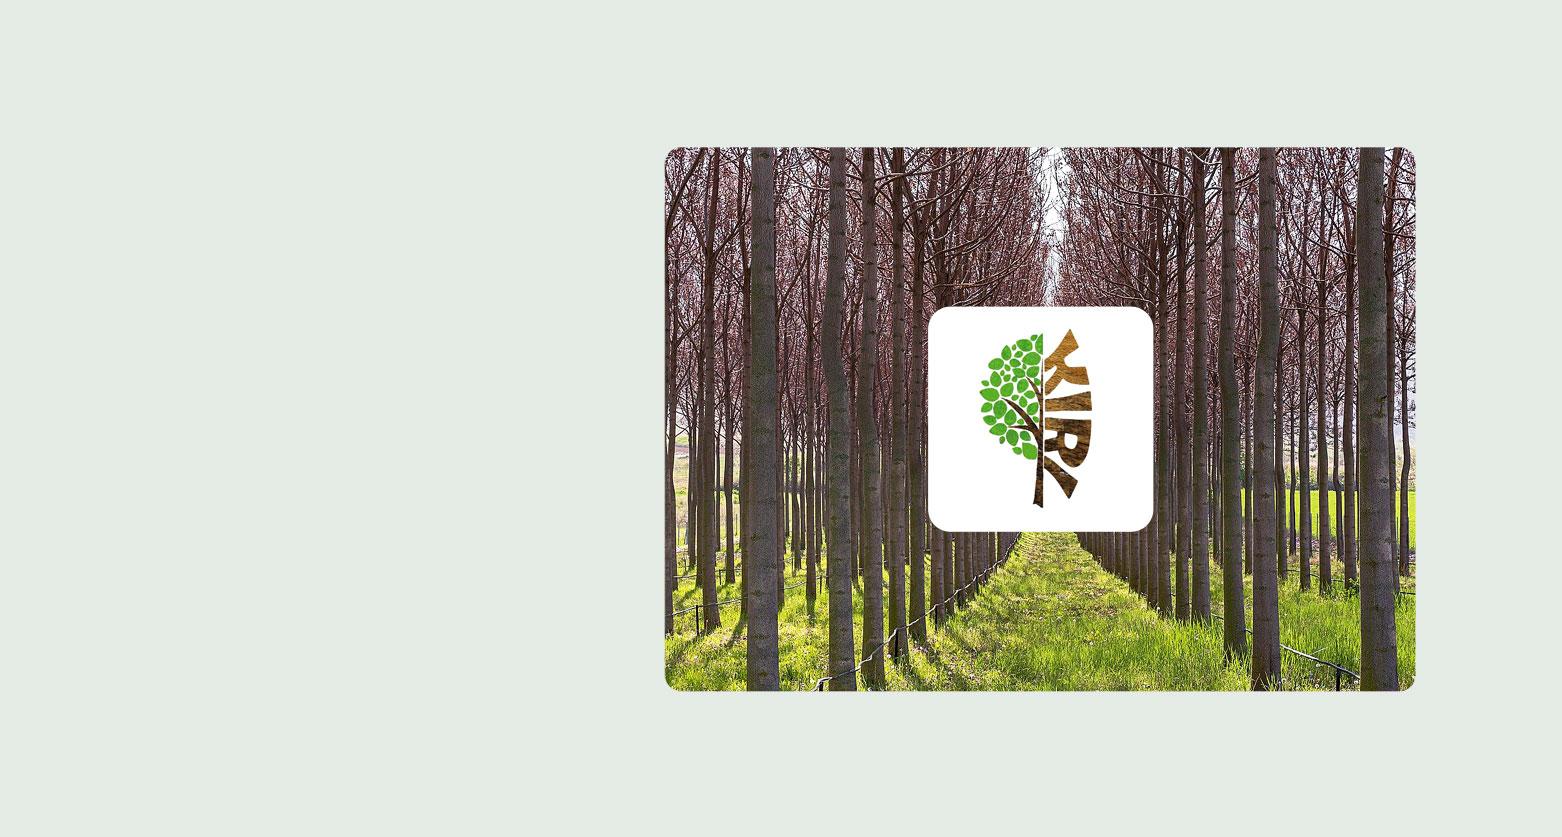 Kiritrees Plantage